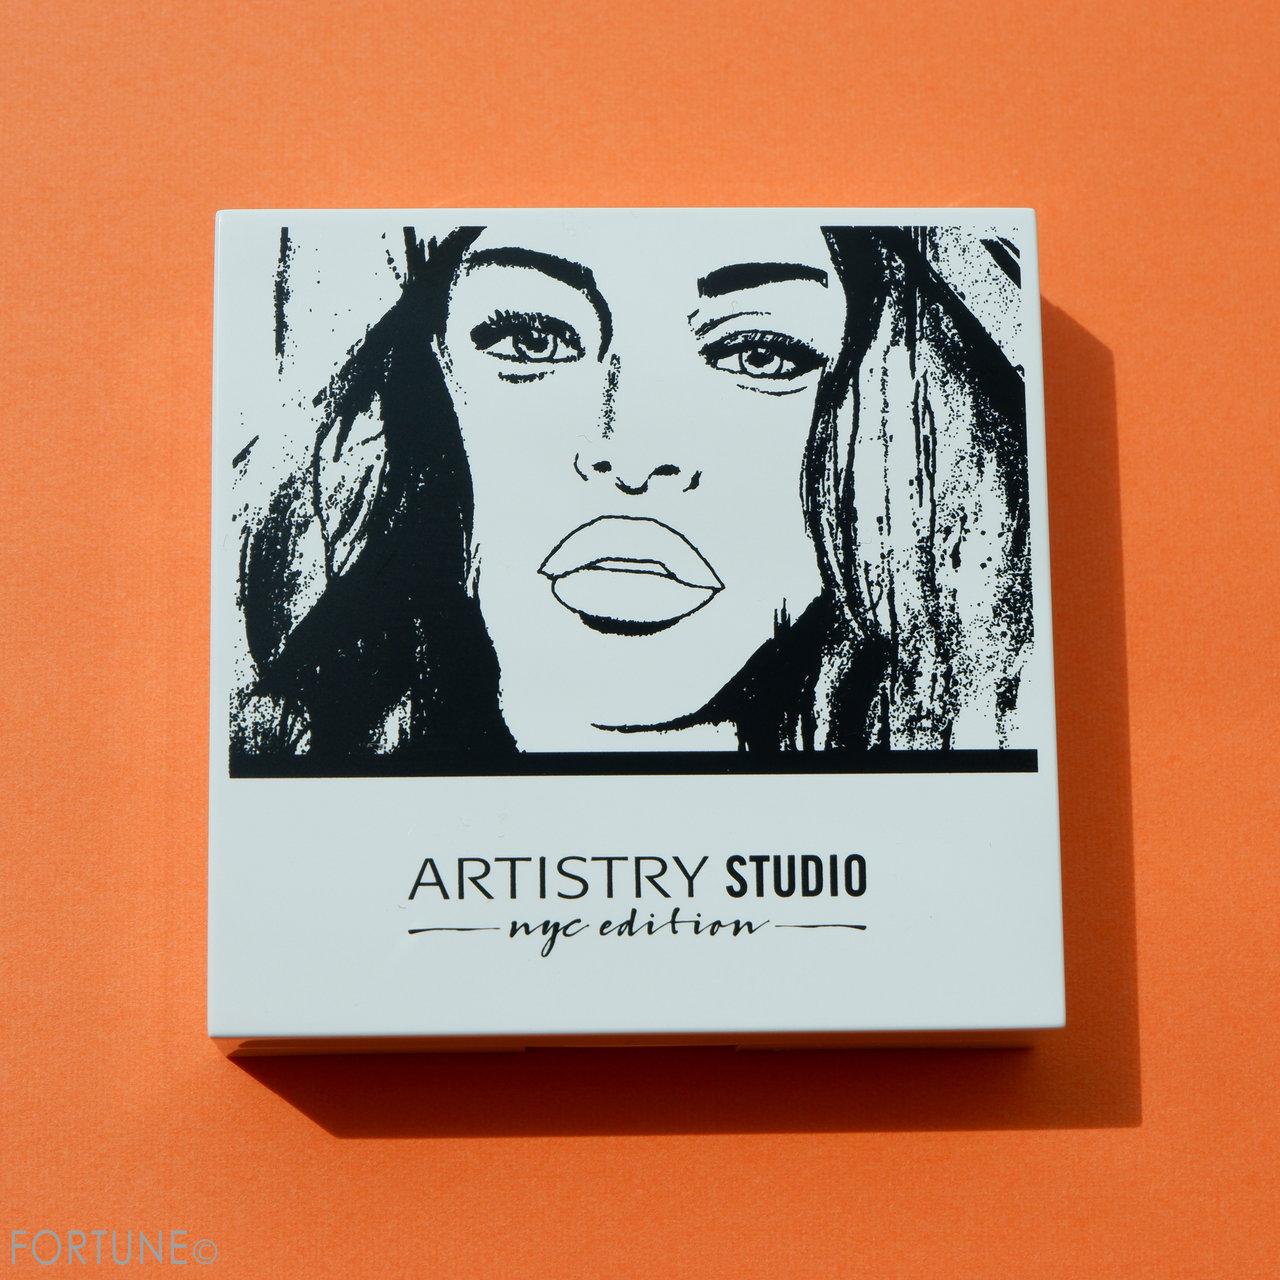 ARTISTRY STUDIO NYC EDITION イルミネイティング ライトアップ コンパクト